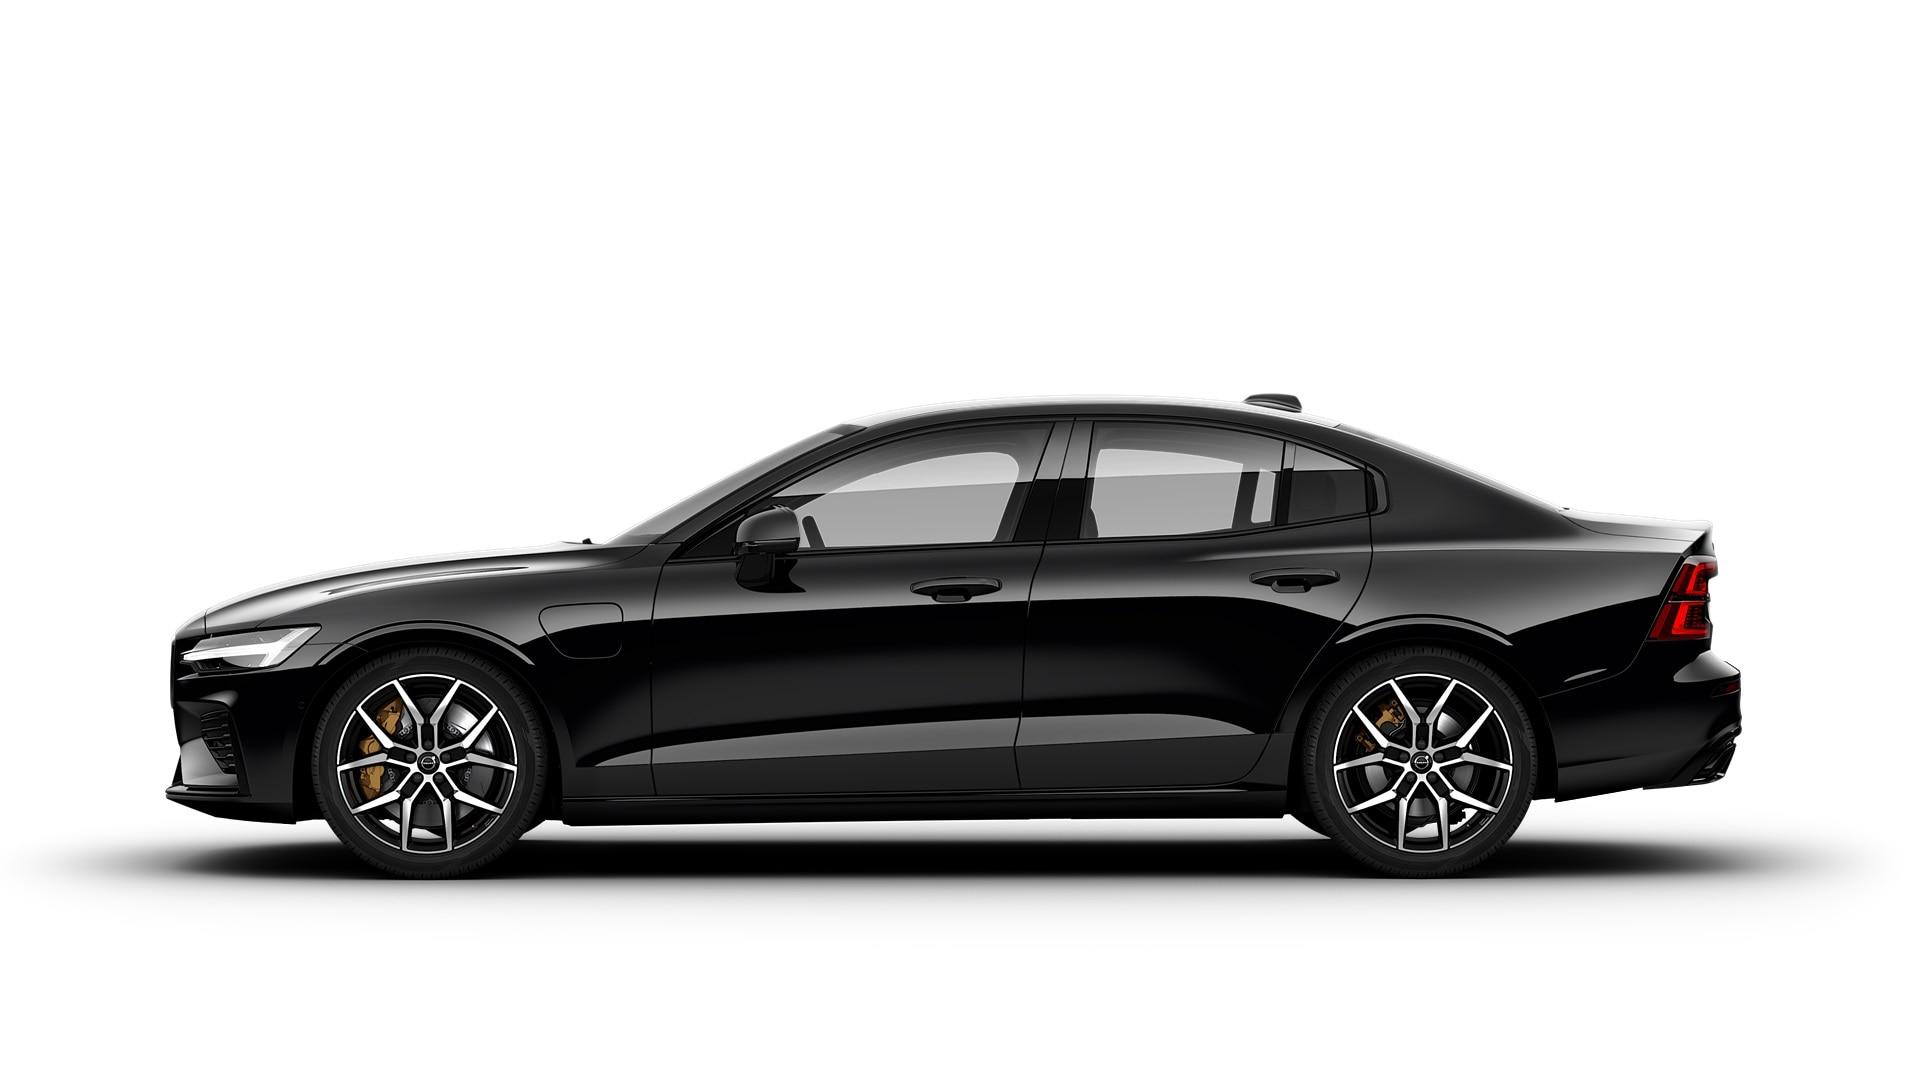 Volvo S60 2020 Pierre noire